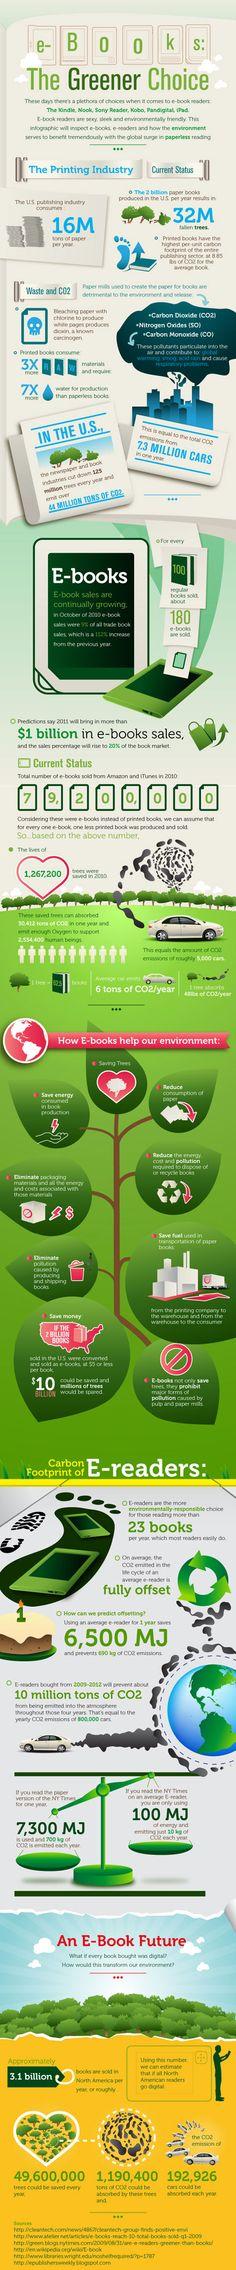 e-Books:  the greener choice